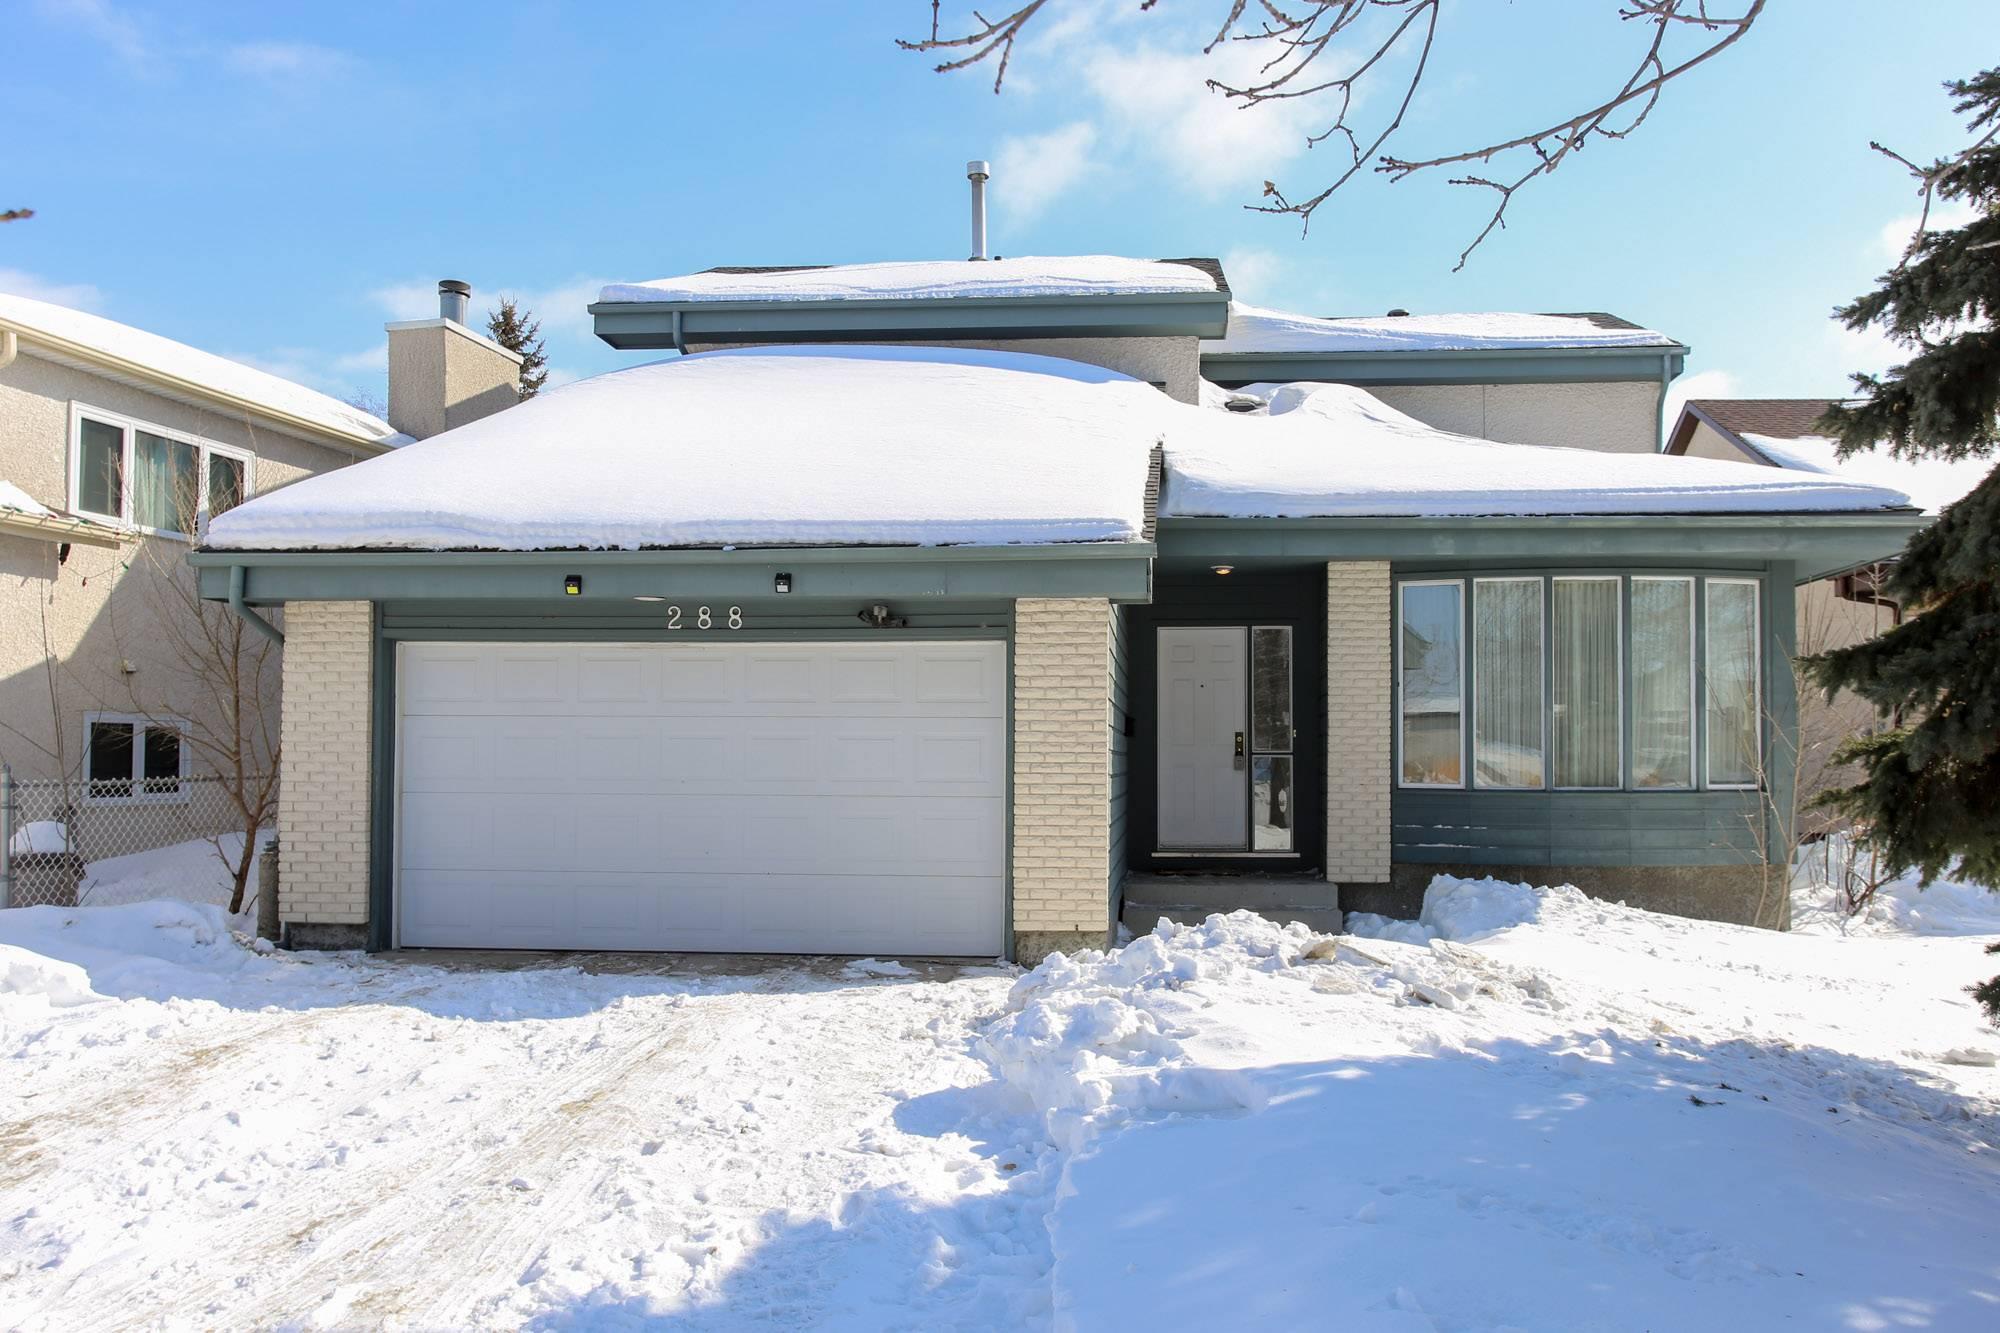 288 Southglen Boulevard, Winnipeg, Manitoba  r2n 3L5 - Photo 30 - 1905183